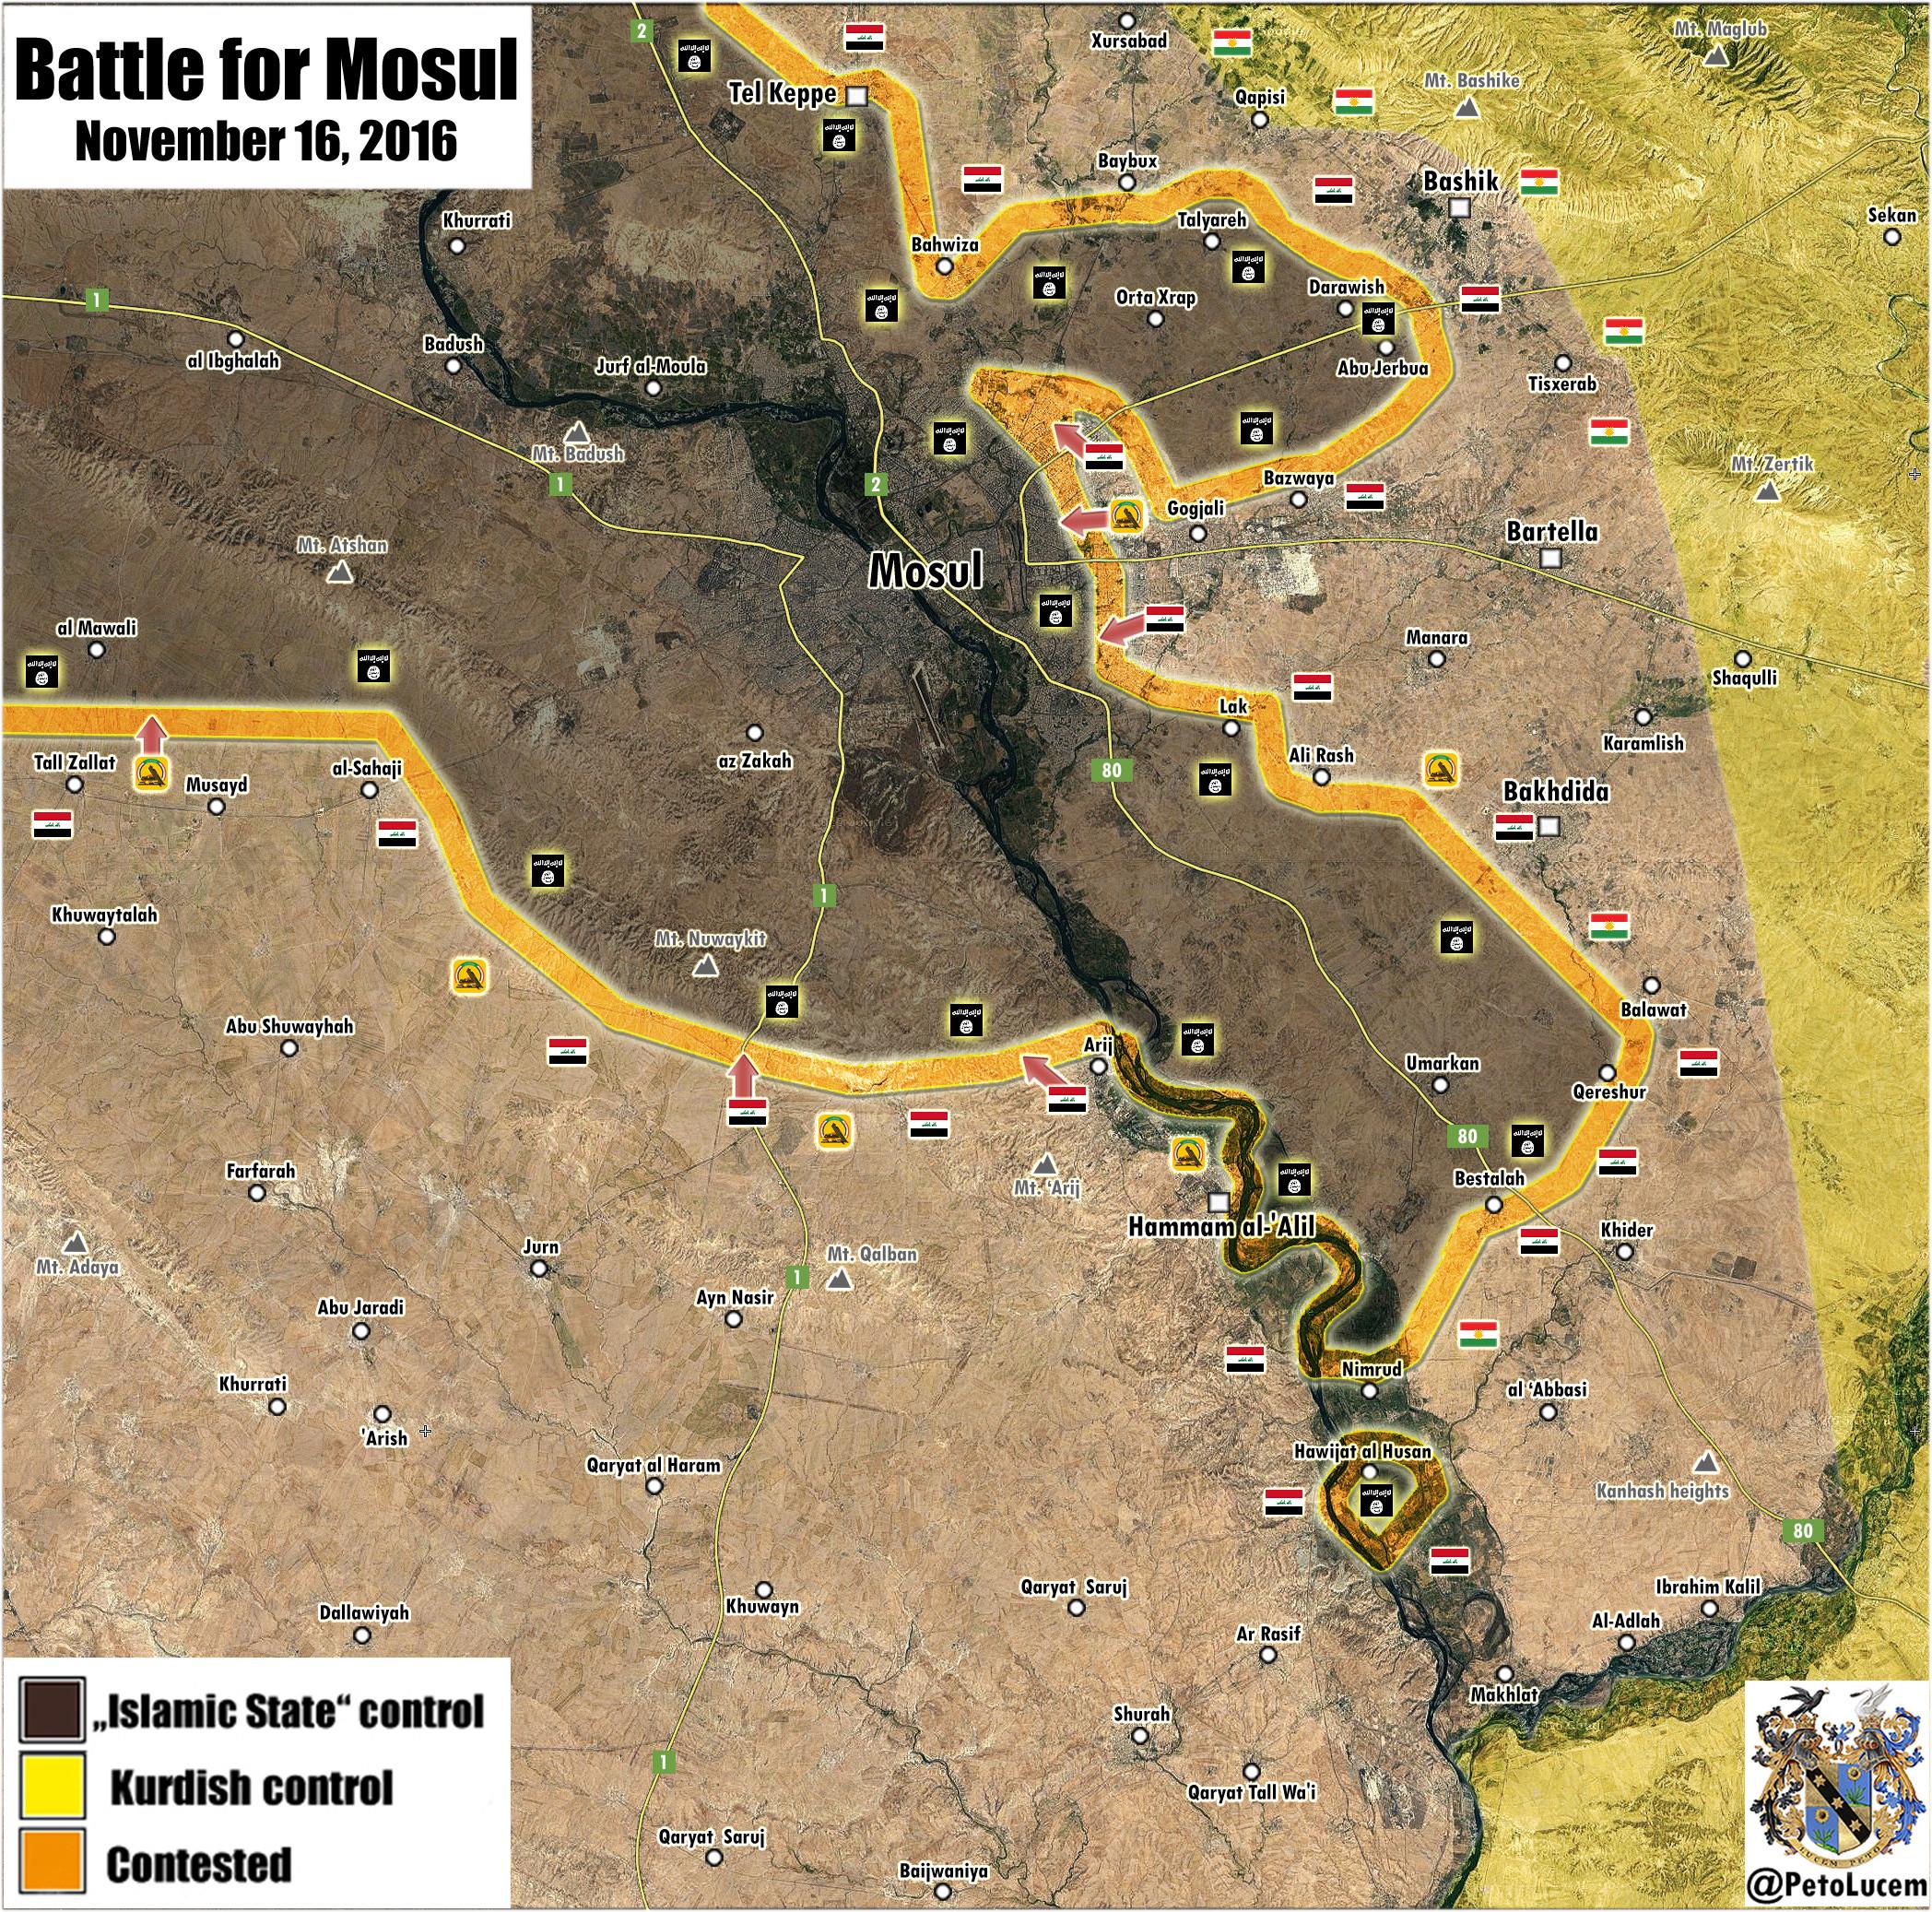 Iraqi War Map Update: Battle for Mosul on November 16, 2016